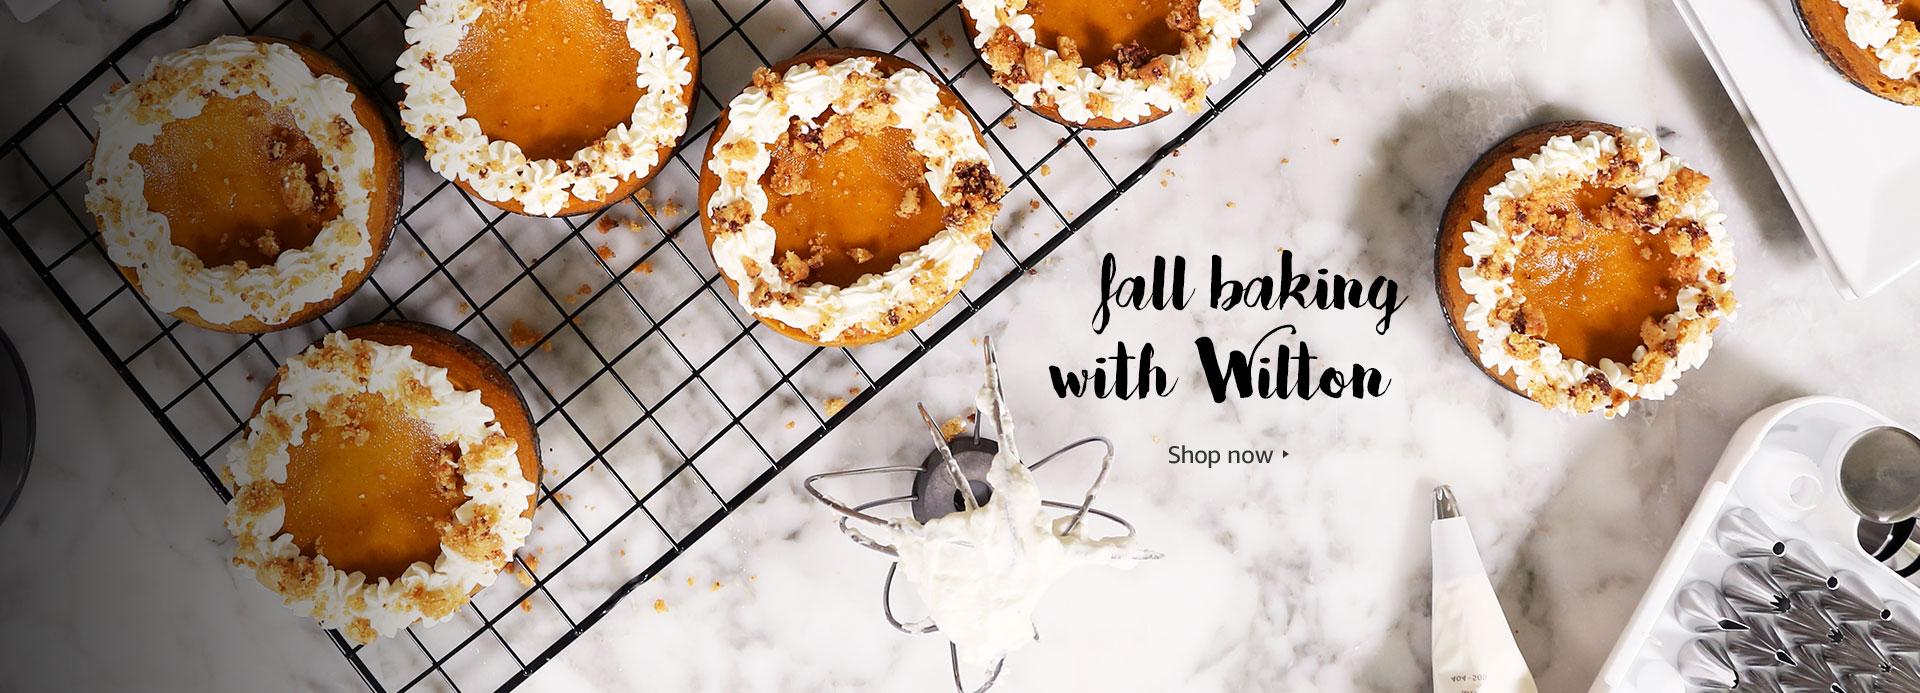 Fall baking with Wilton